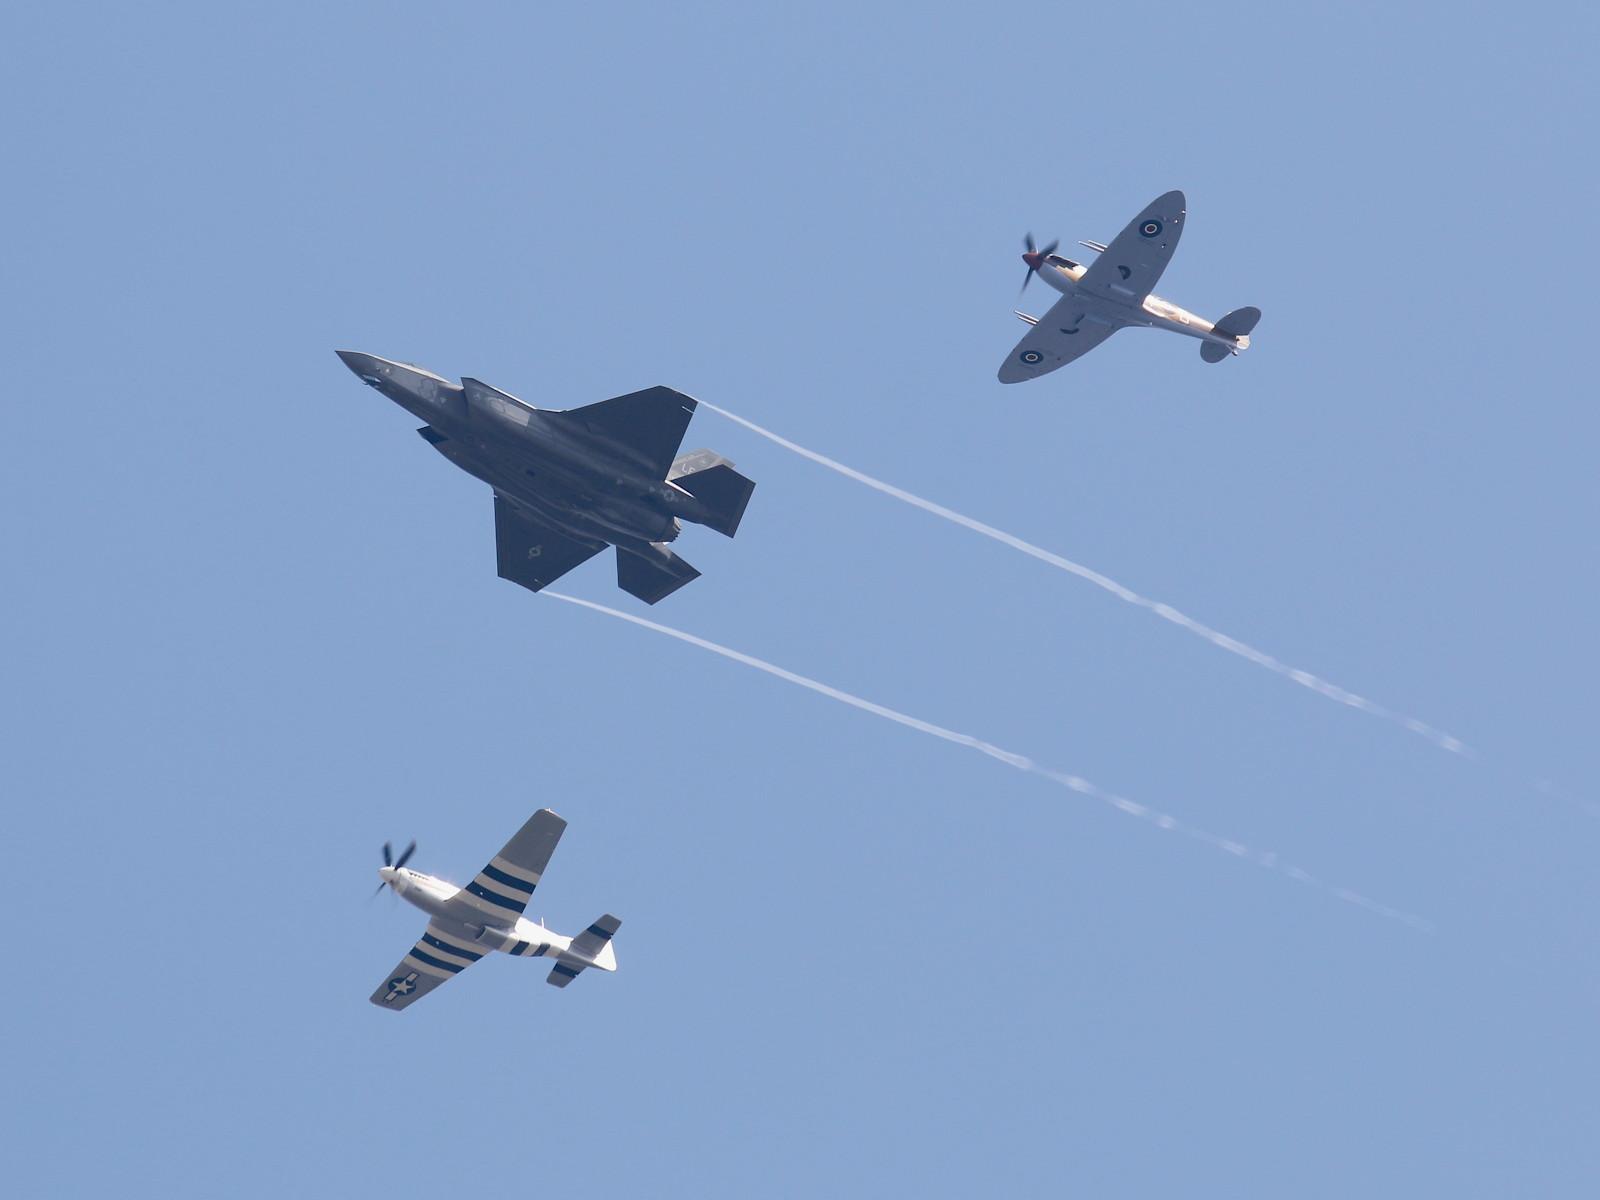 USAF Heritage Flight Team und RAF Spitfire © Doppeladler.com